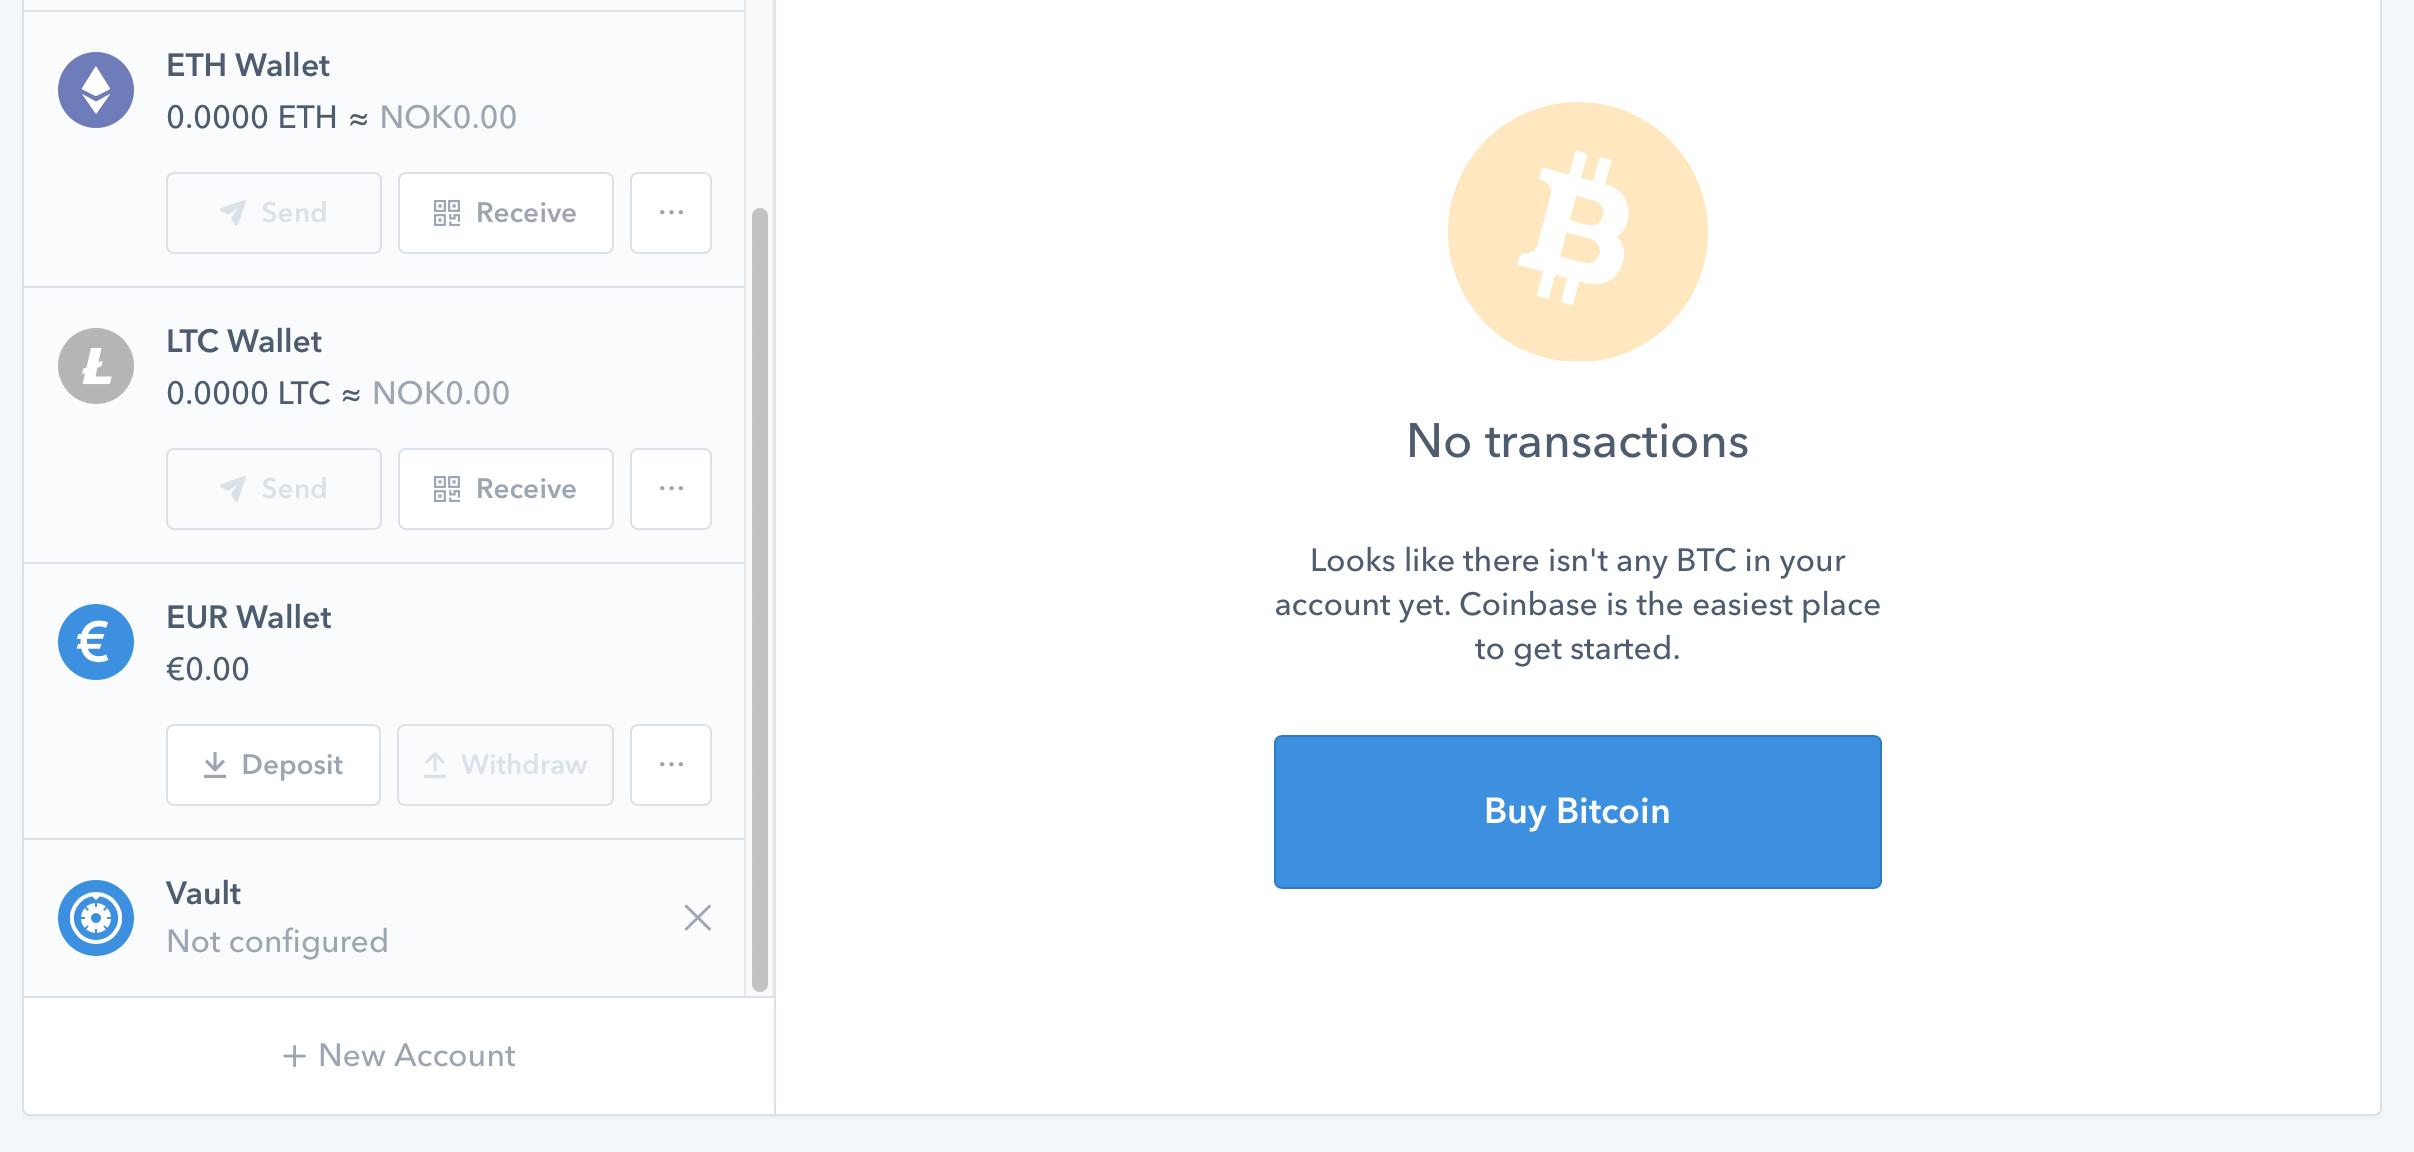 Coinbase-handel - steg 5